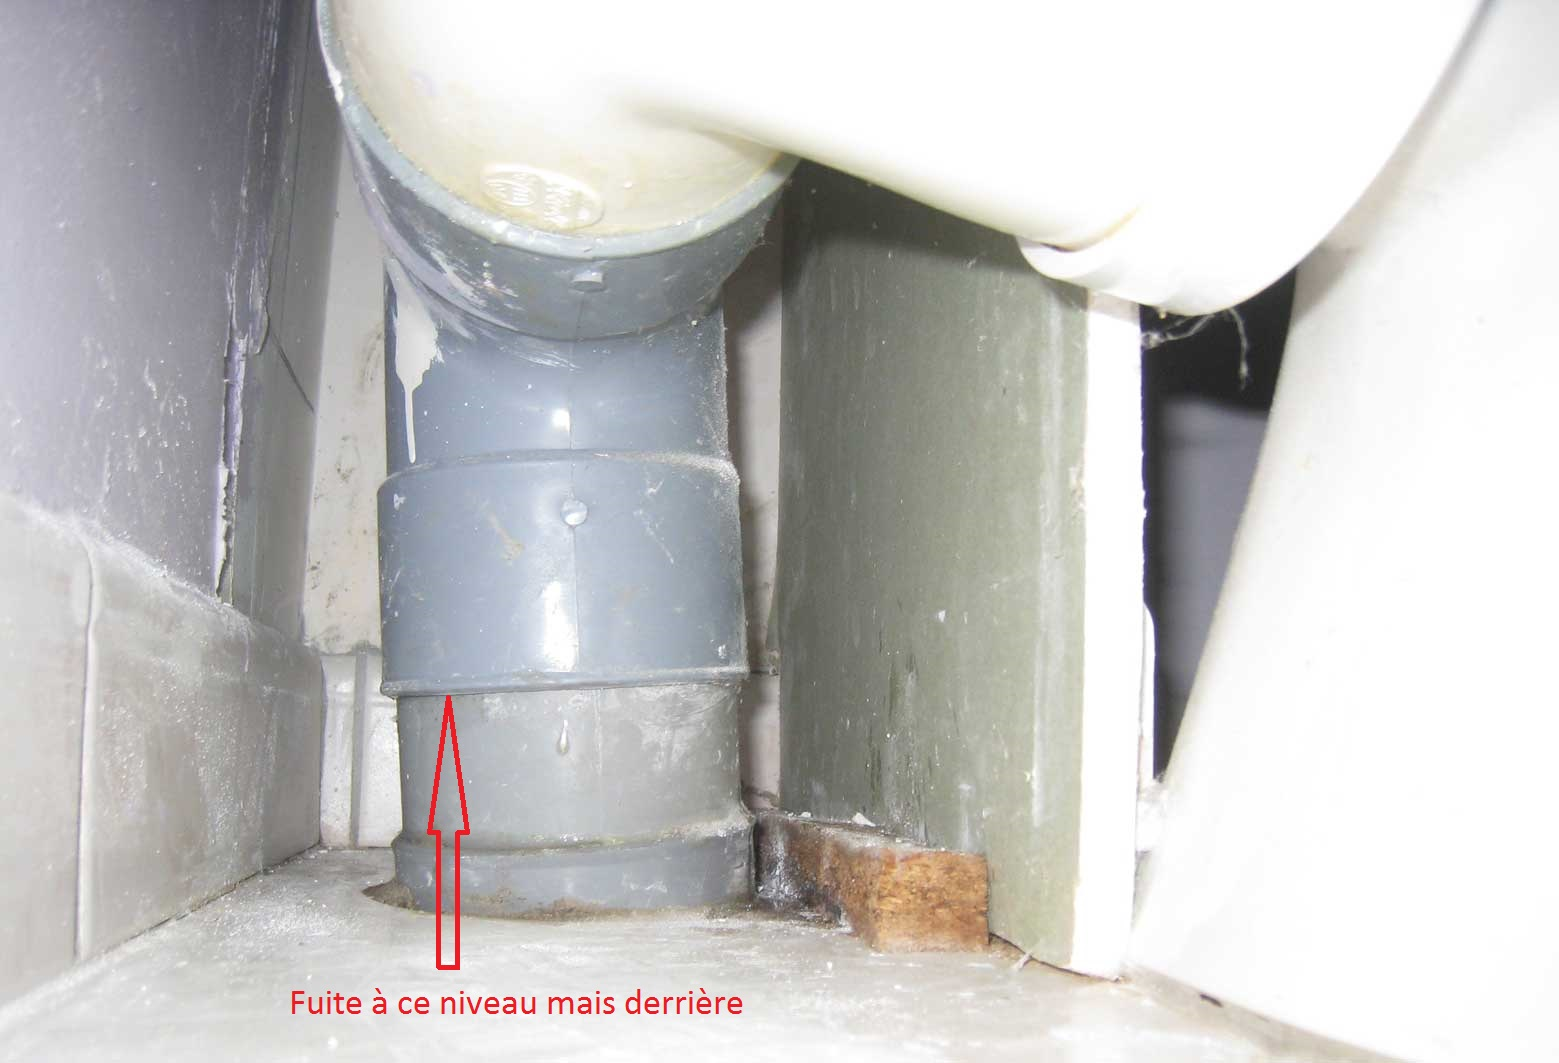 fuite vacuation wc. Black Bedroom Furniture Sets. Home Design Ideas